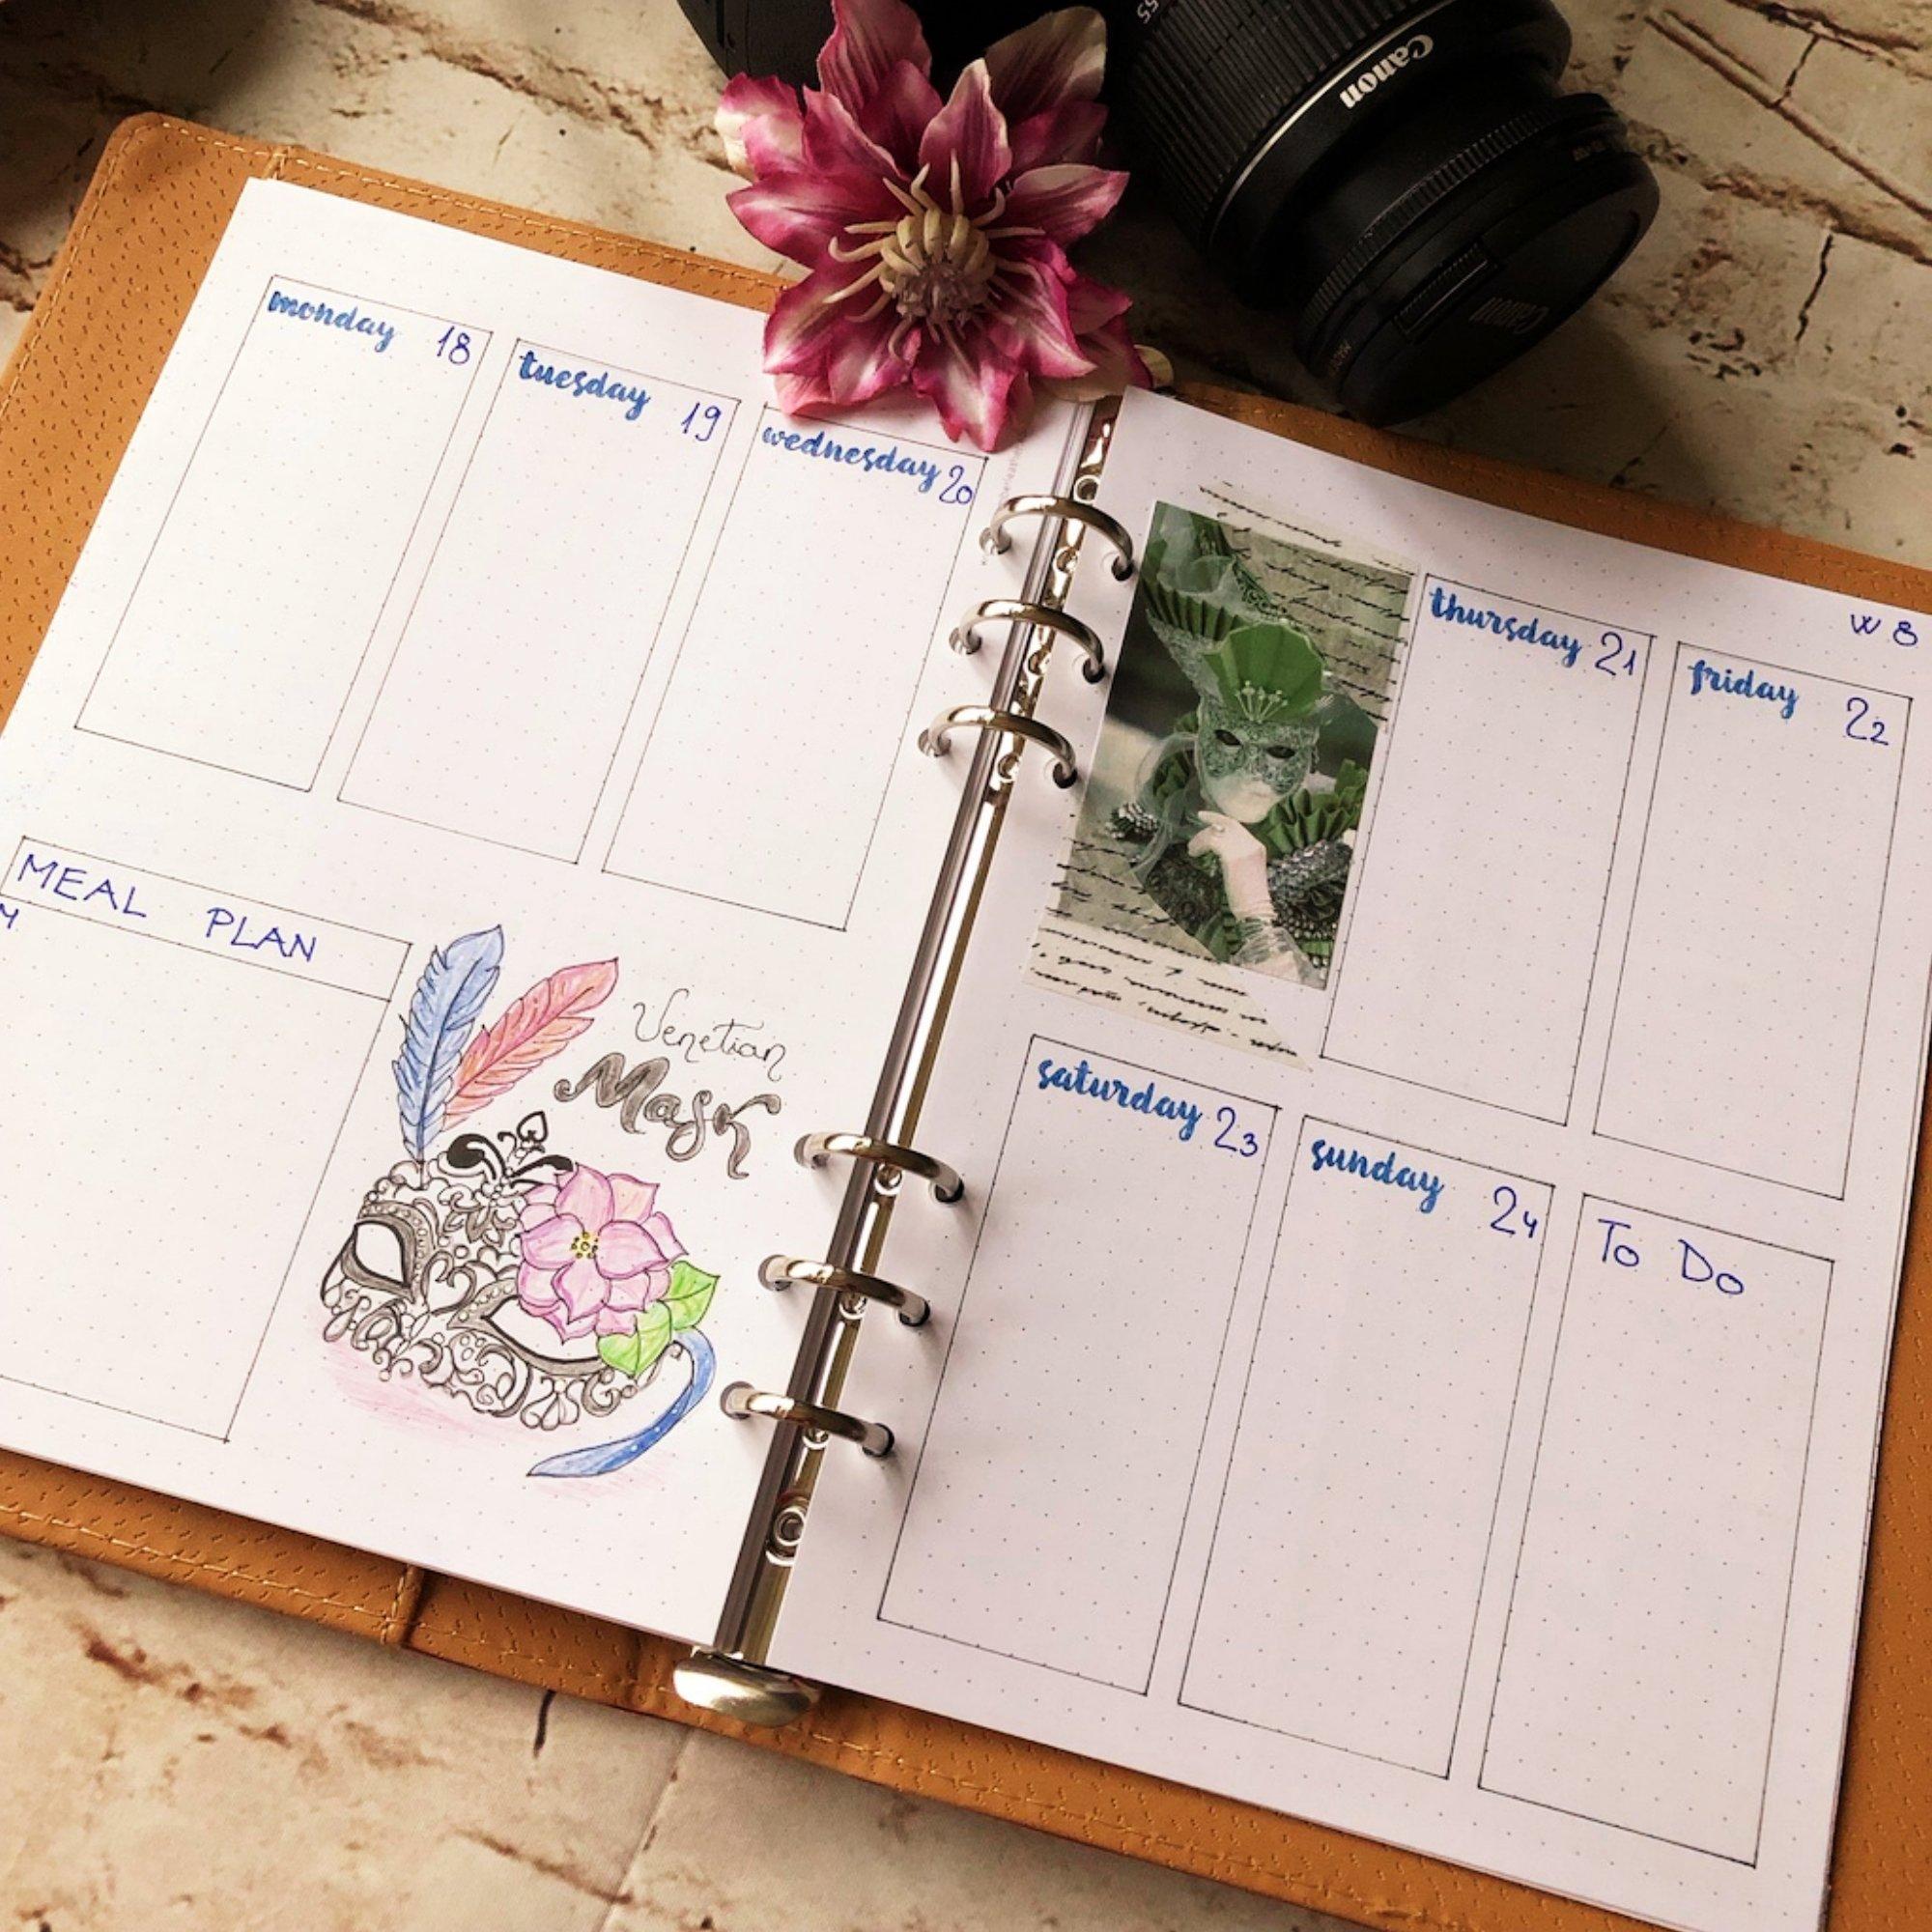 Creative journaling weekly planner - week 8 - itstartswithacoffee.com #creativejournaling #bulletjournaling #planner #weeklyplanner #weekly #February #2019 #week8